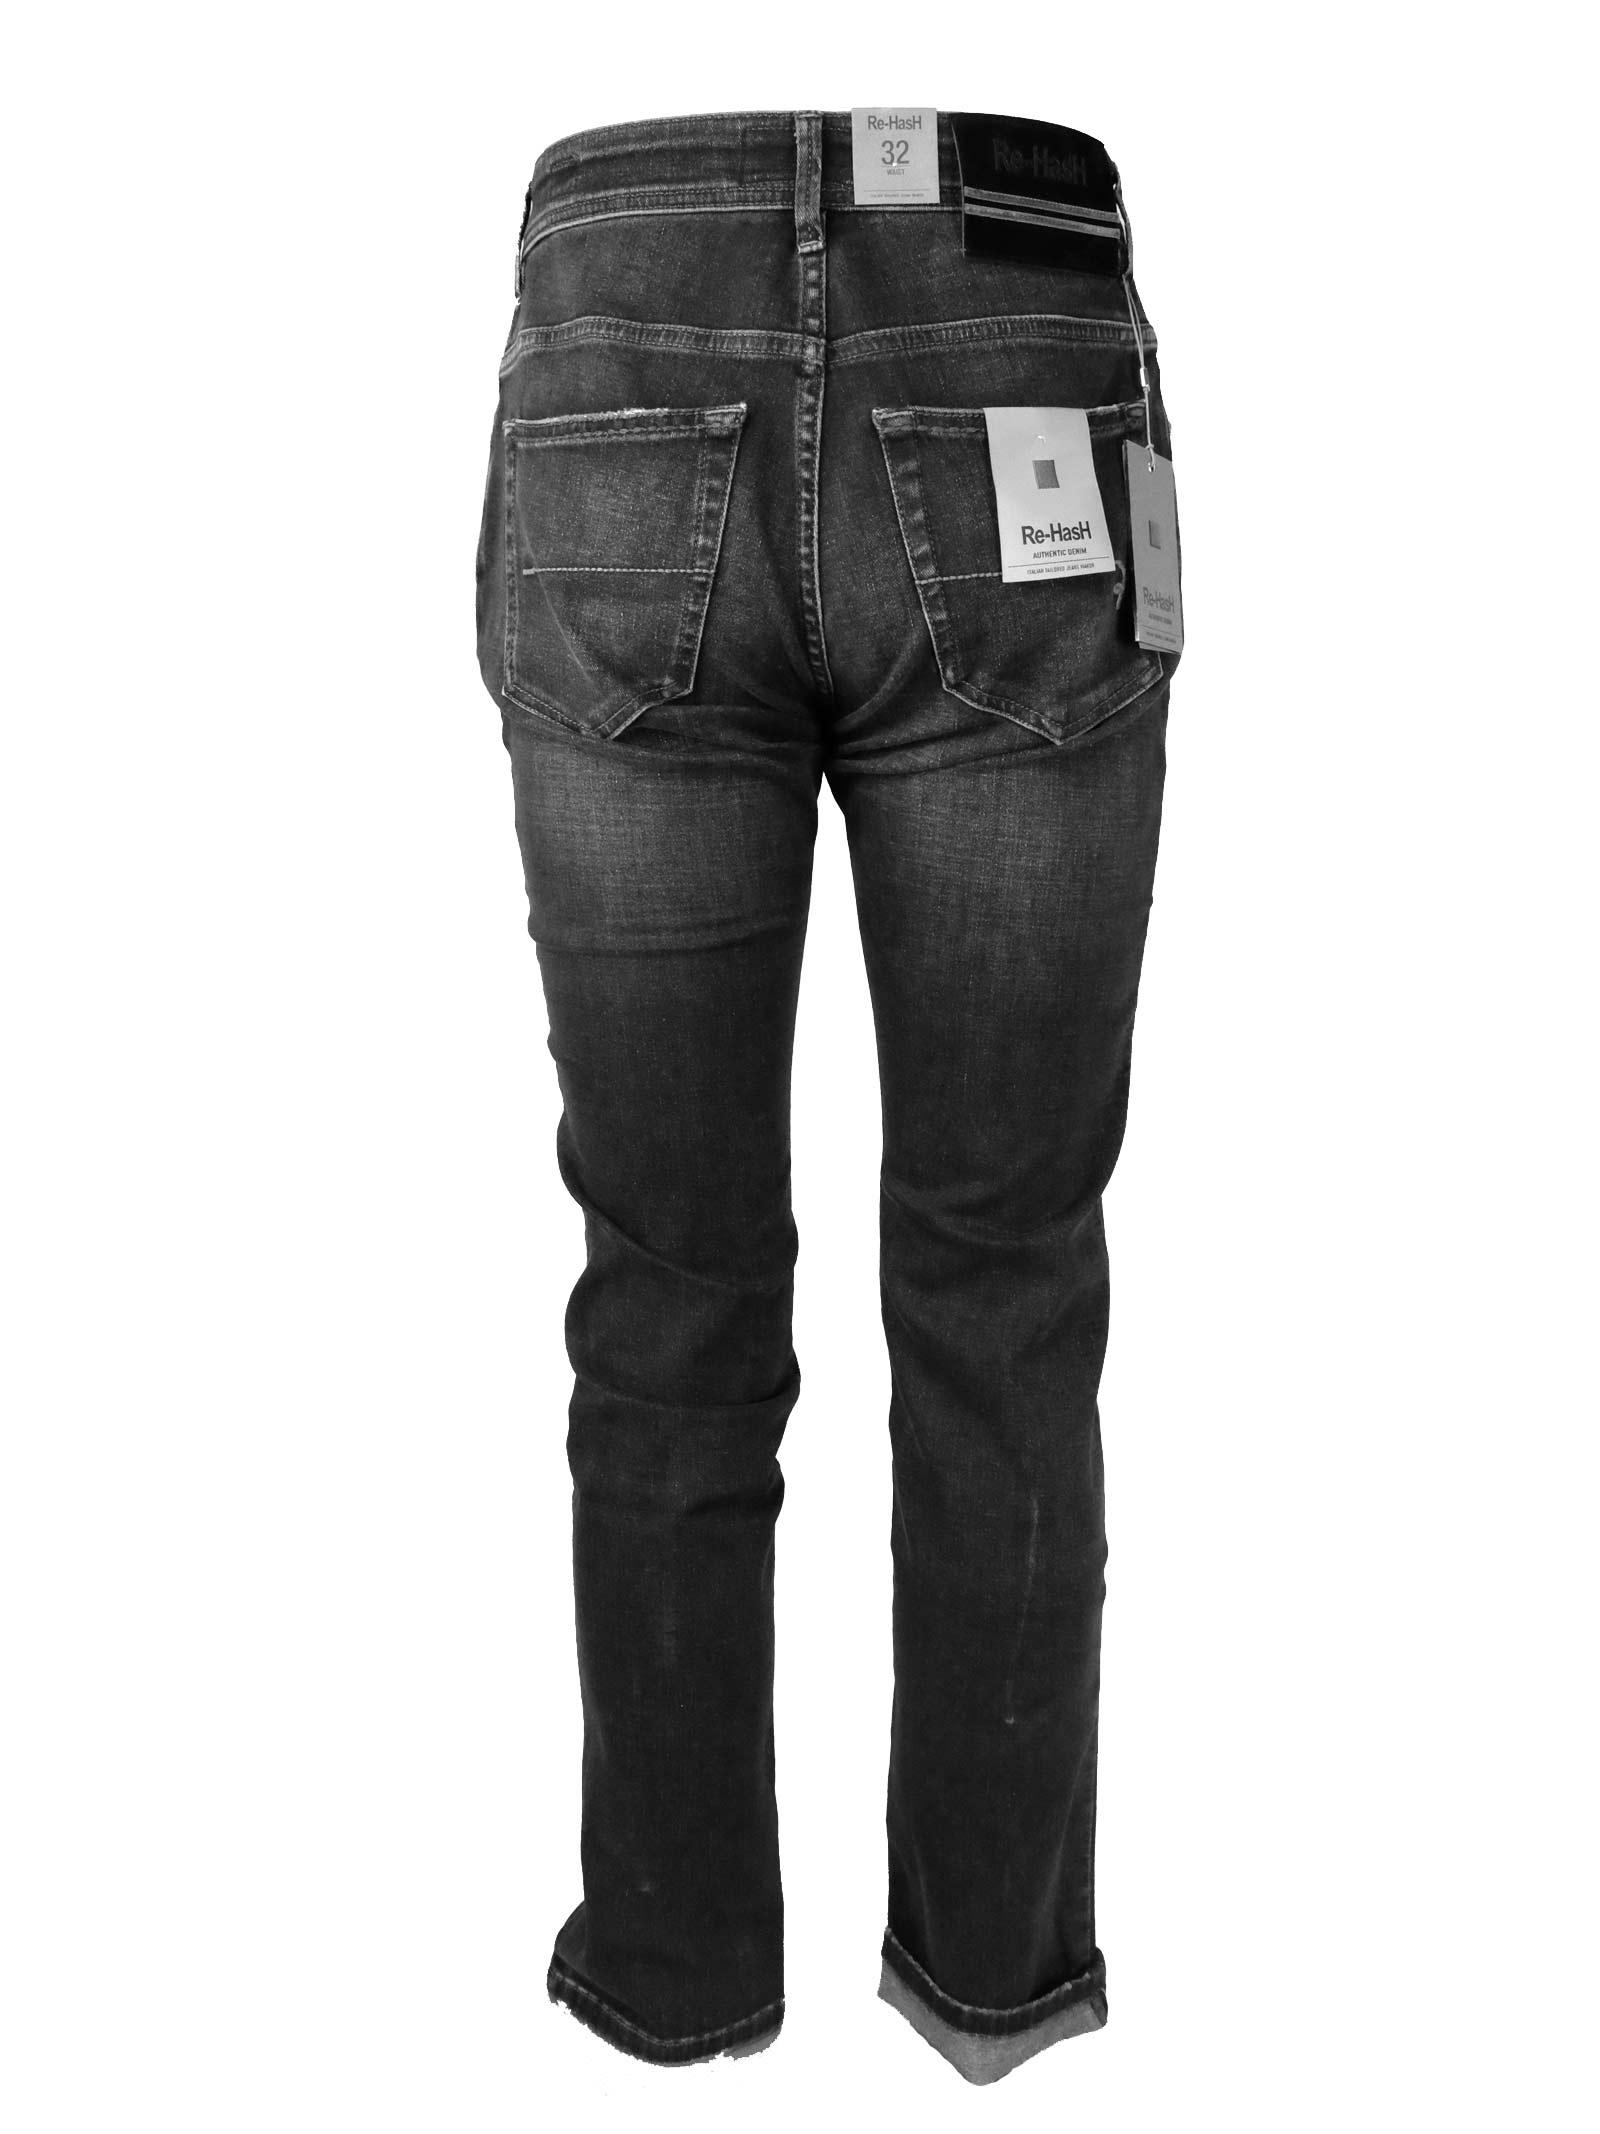 JEANS 11 OZ. GRIGIO Re-HasH | Pantaloni | HOPPER 2723 PS13937BLACK